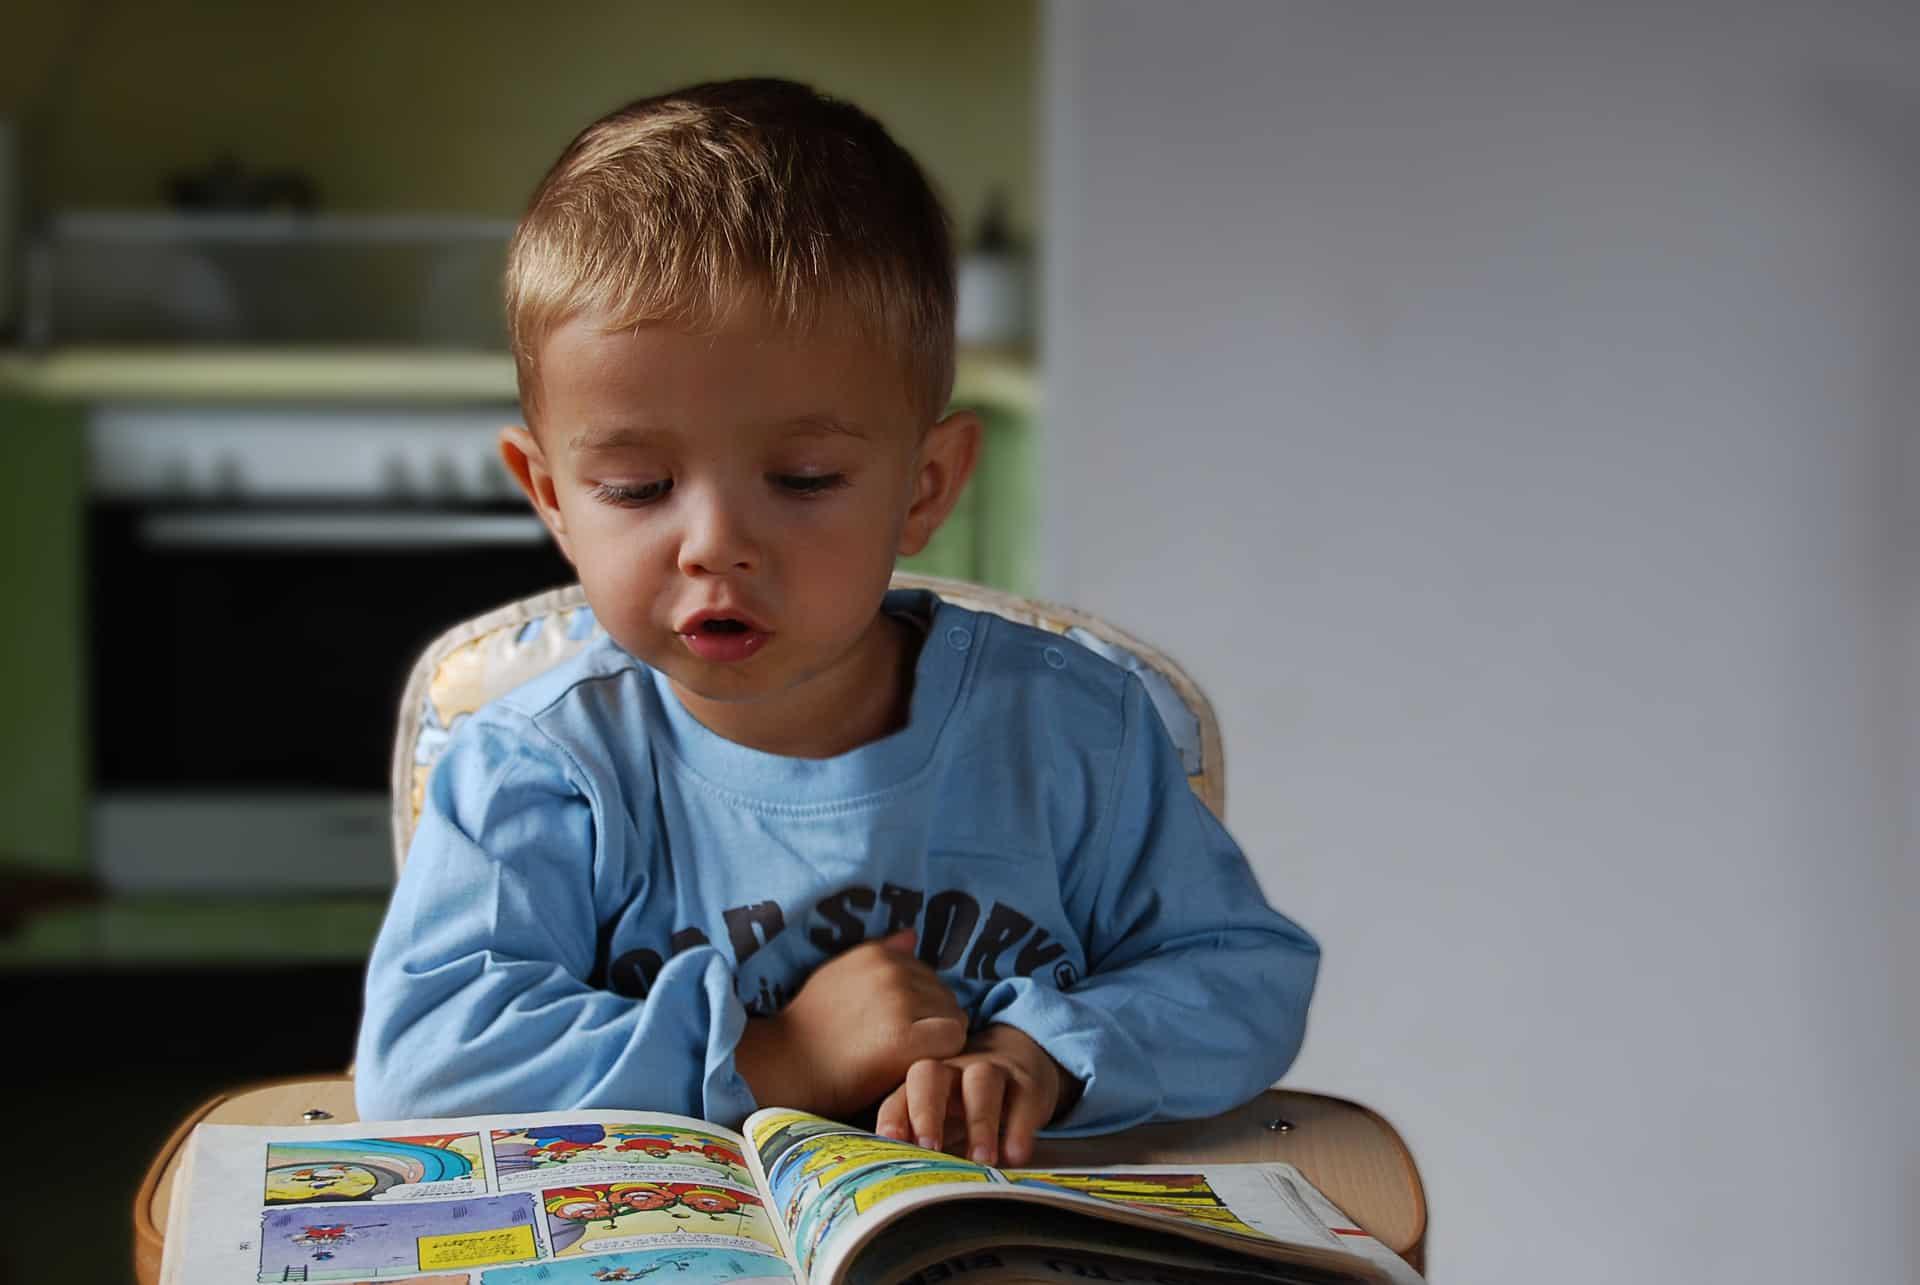 7 proven scientific benefits of reading books